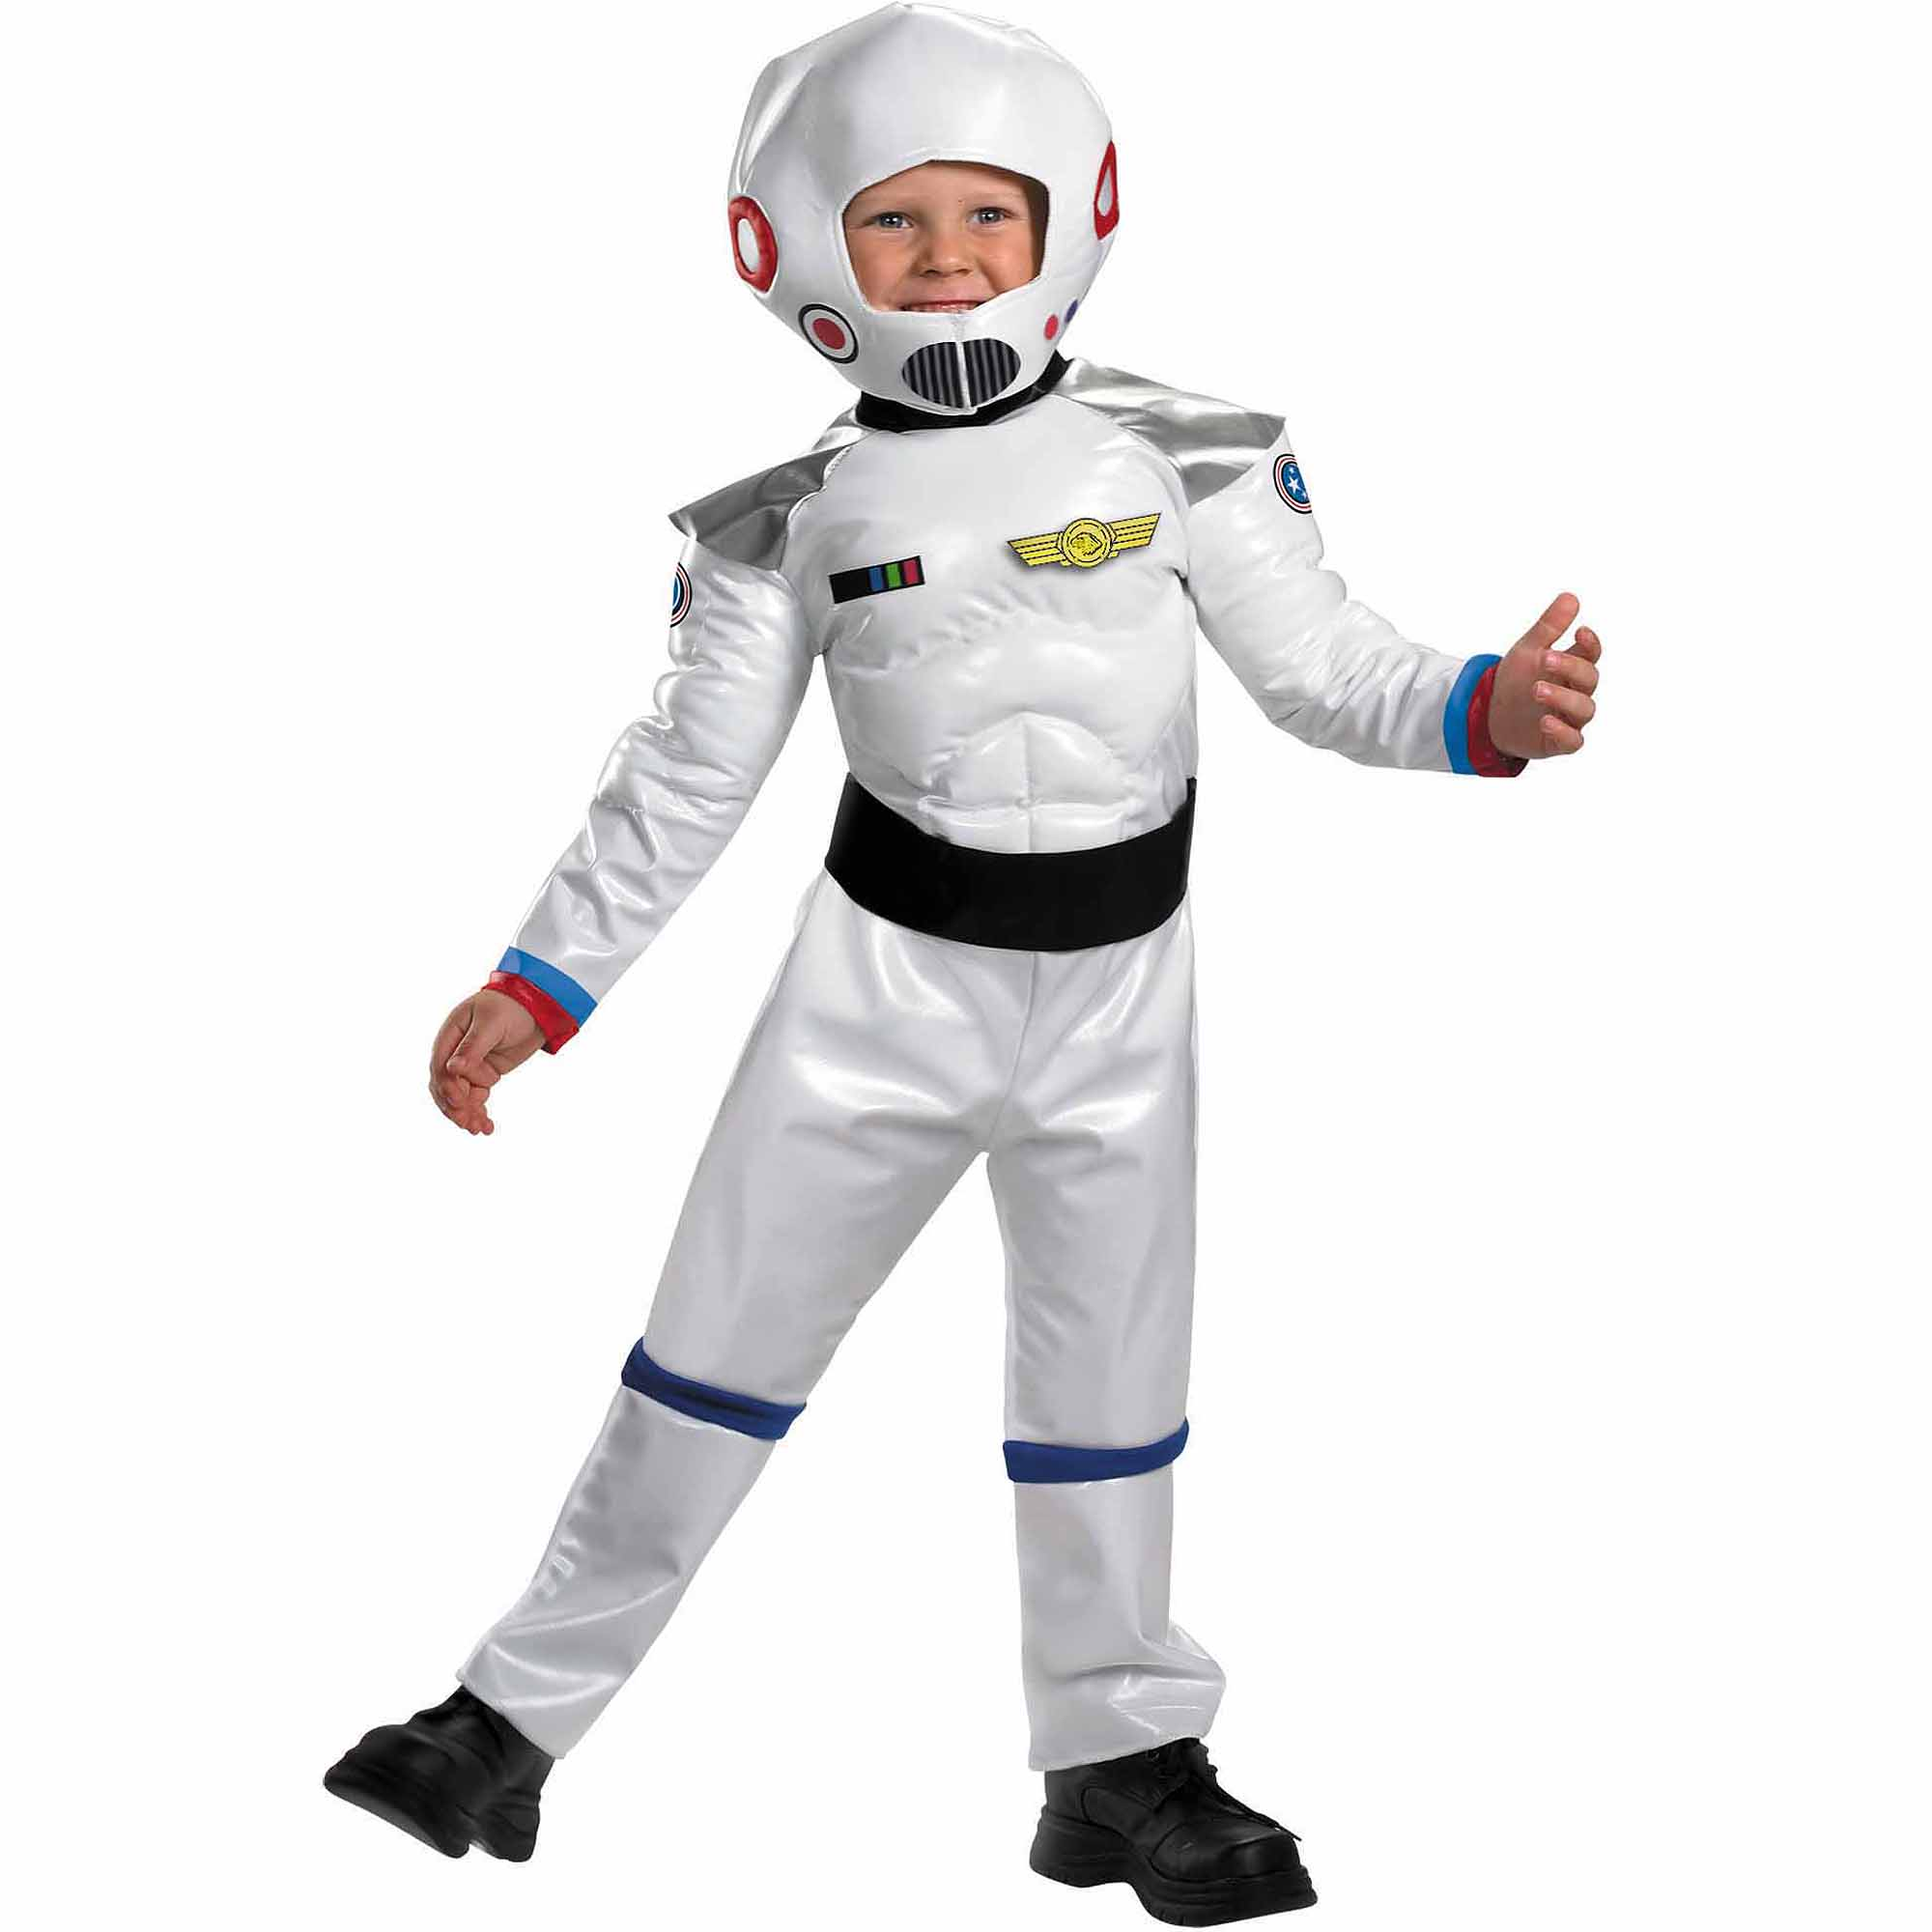 Blast Off Astronaut Child Halloween Costume